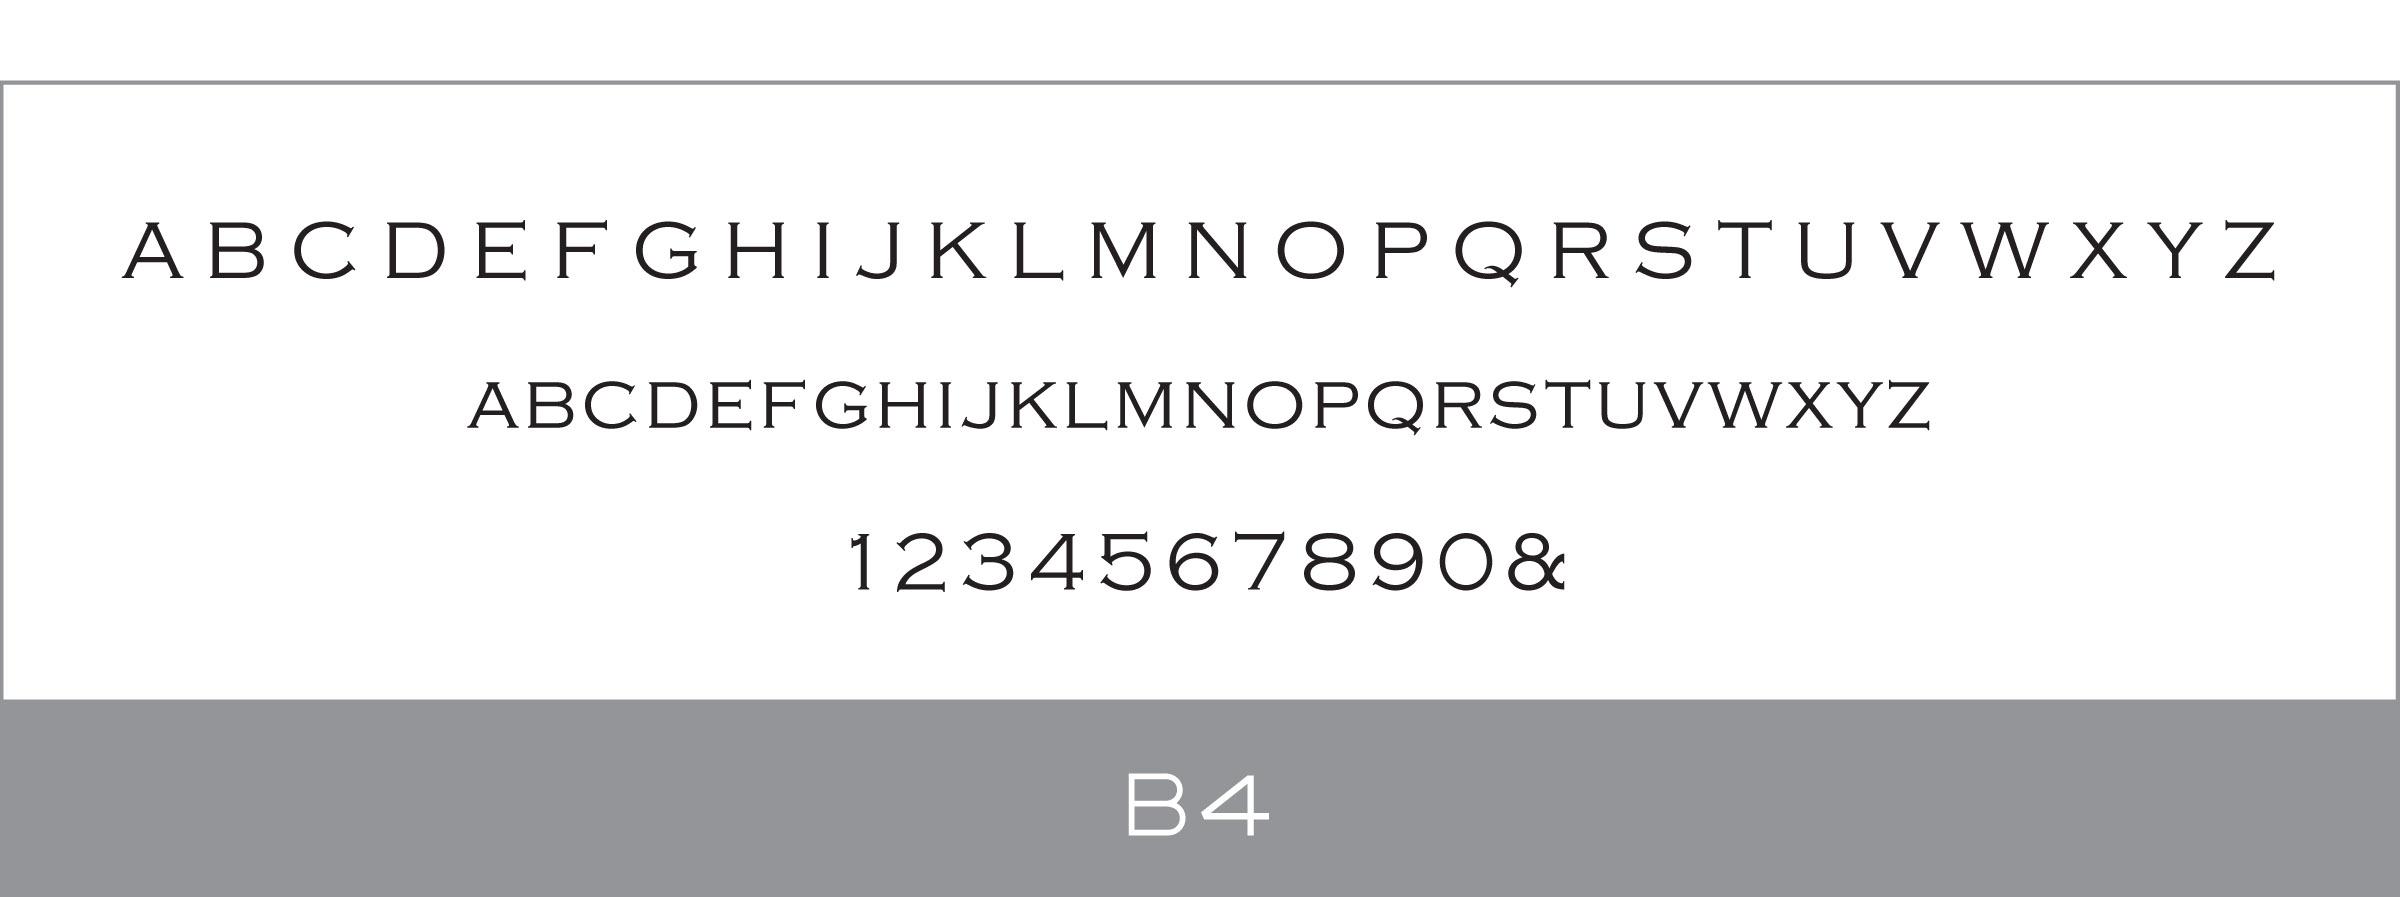 B4_Haute_Papier_Font.jpg